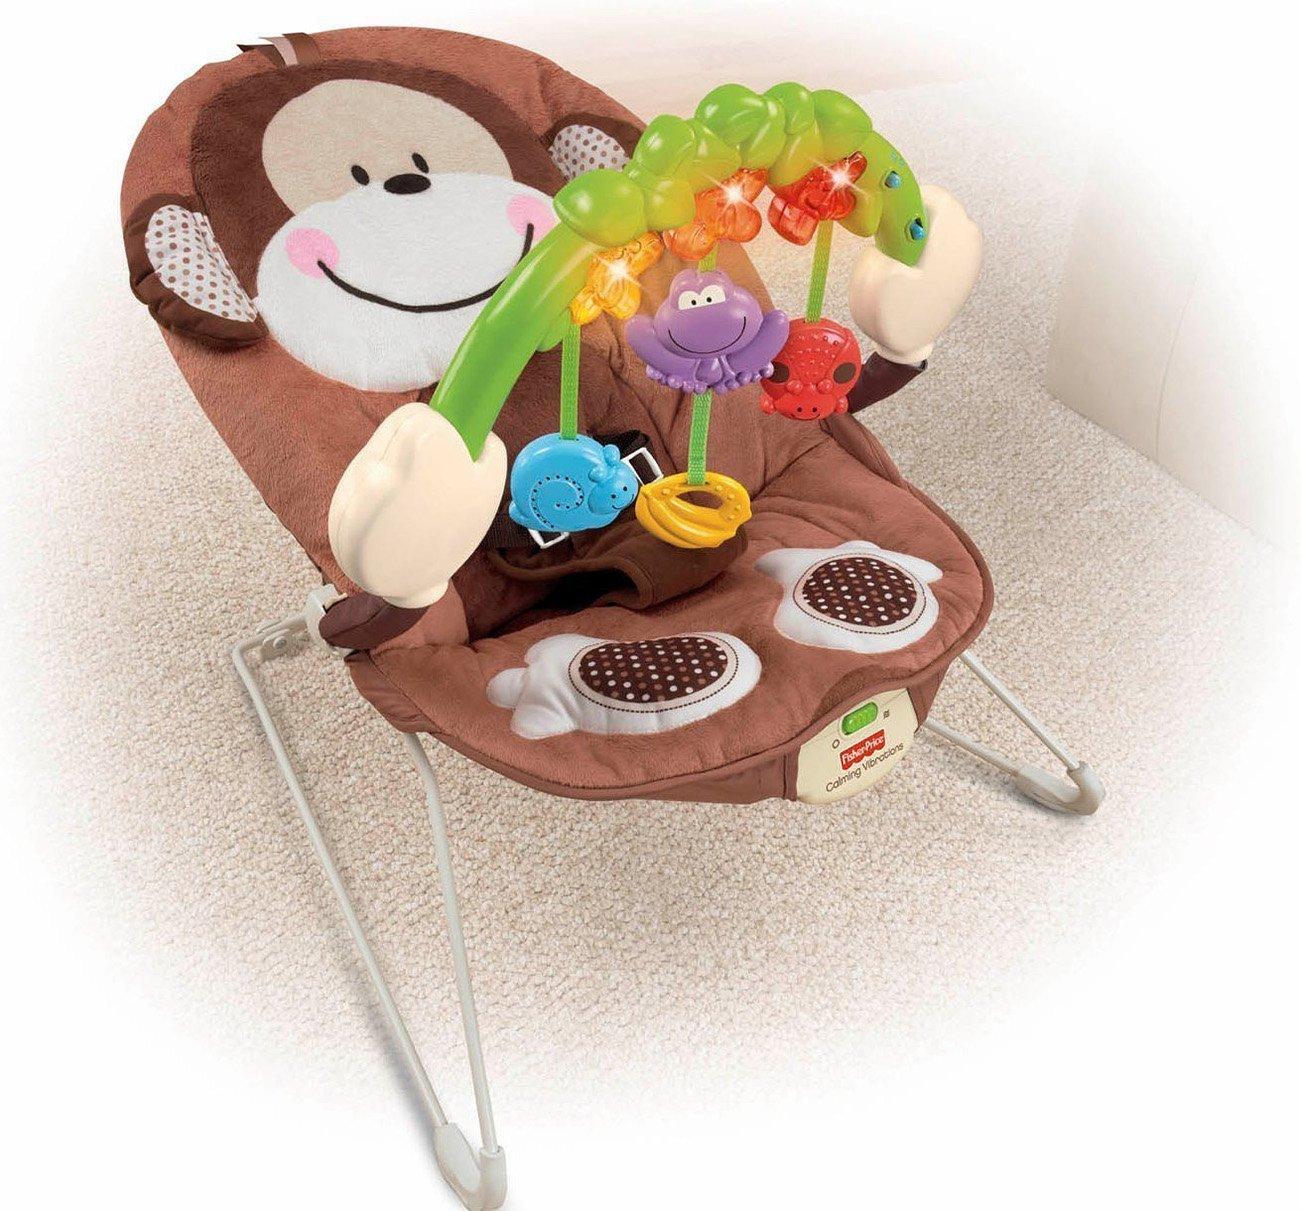 Amazoncom FisherPrice Deluxe Monkey Bouncer Infant Bouncers